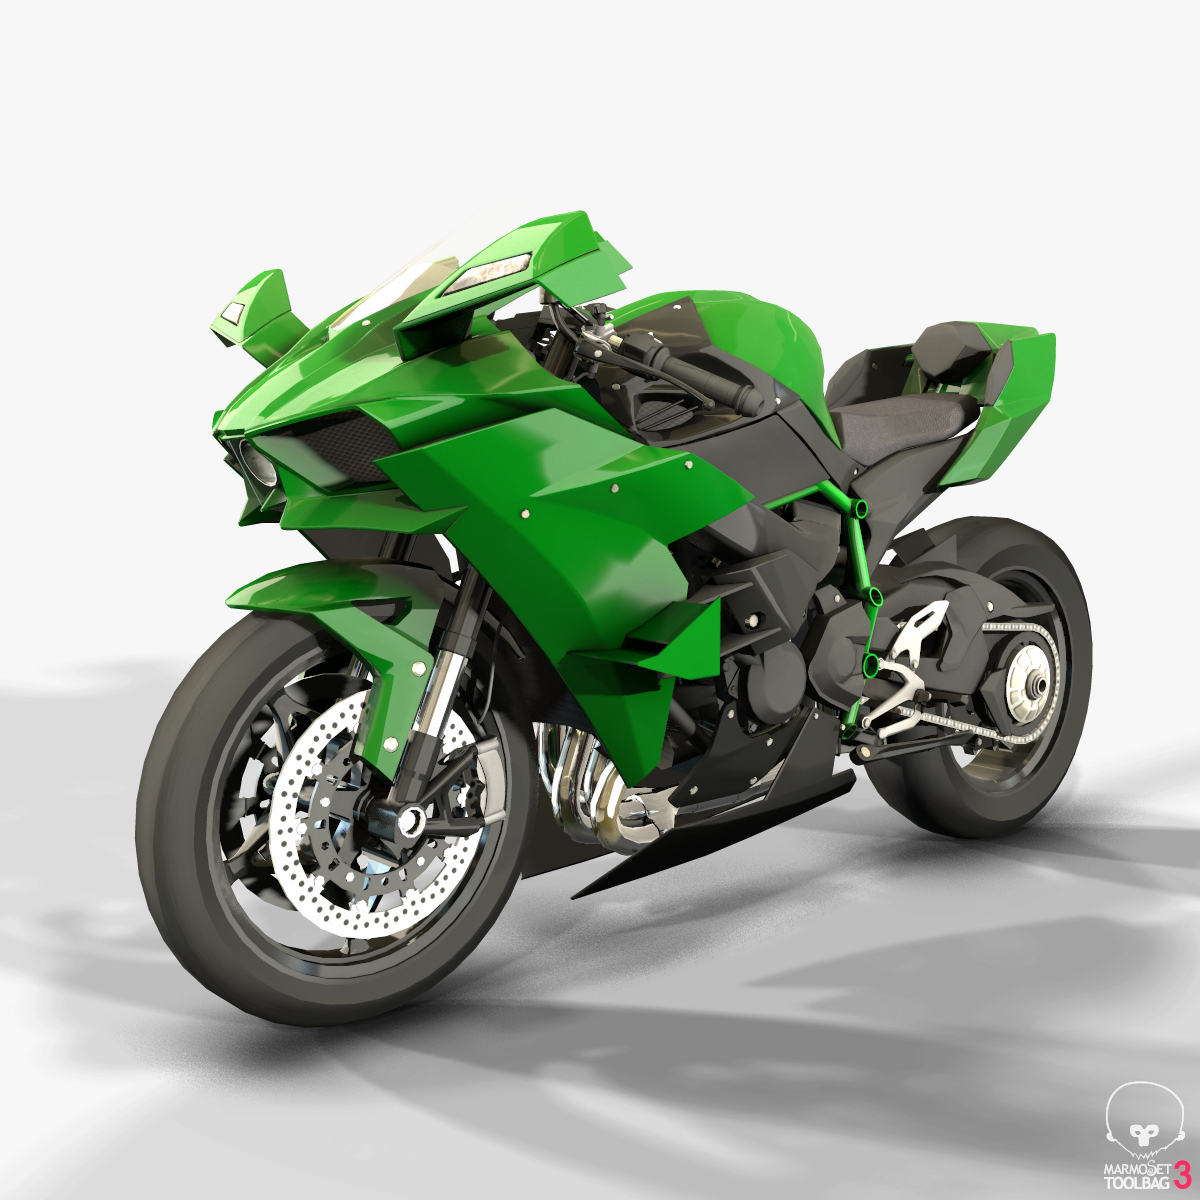 Kawasaki Ninja H2r >> Kawasaki Ninja H2r Low Poly